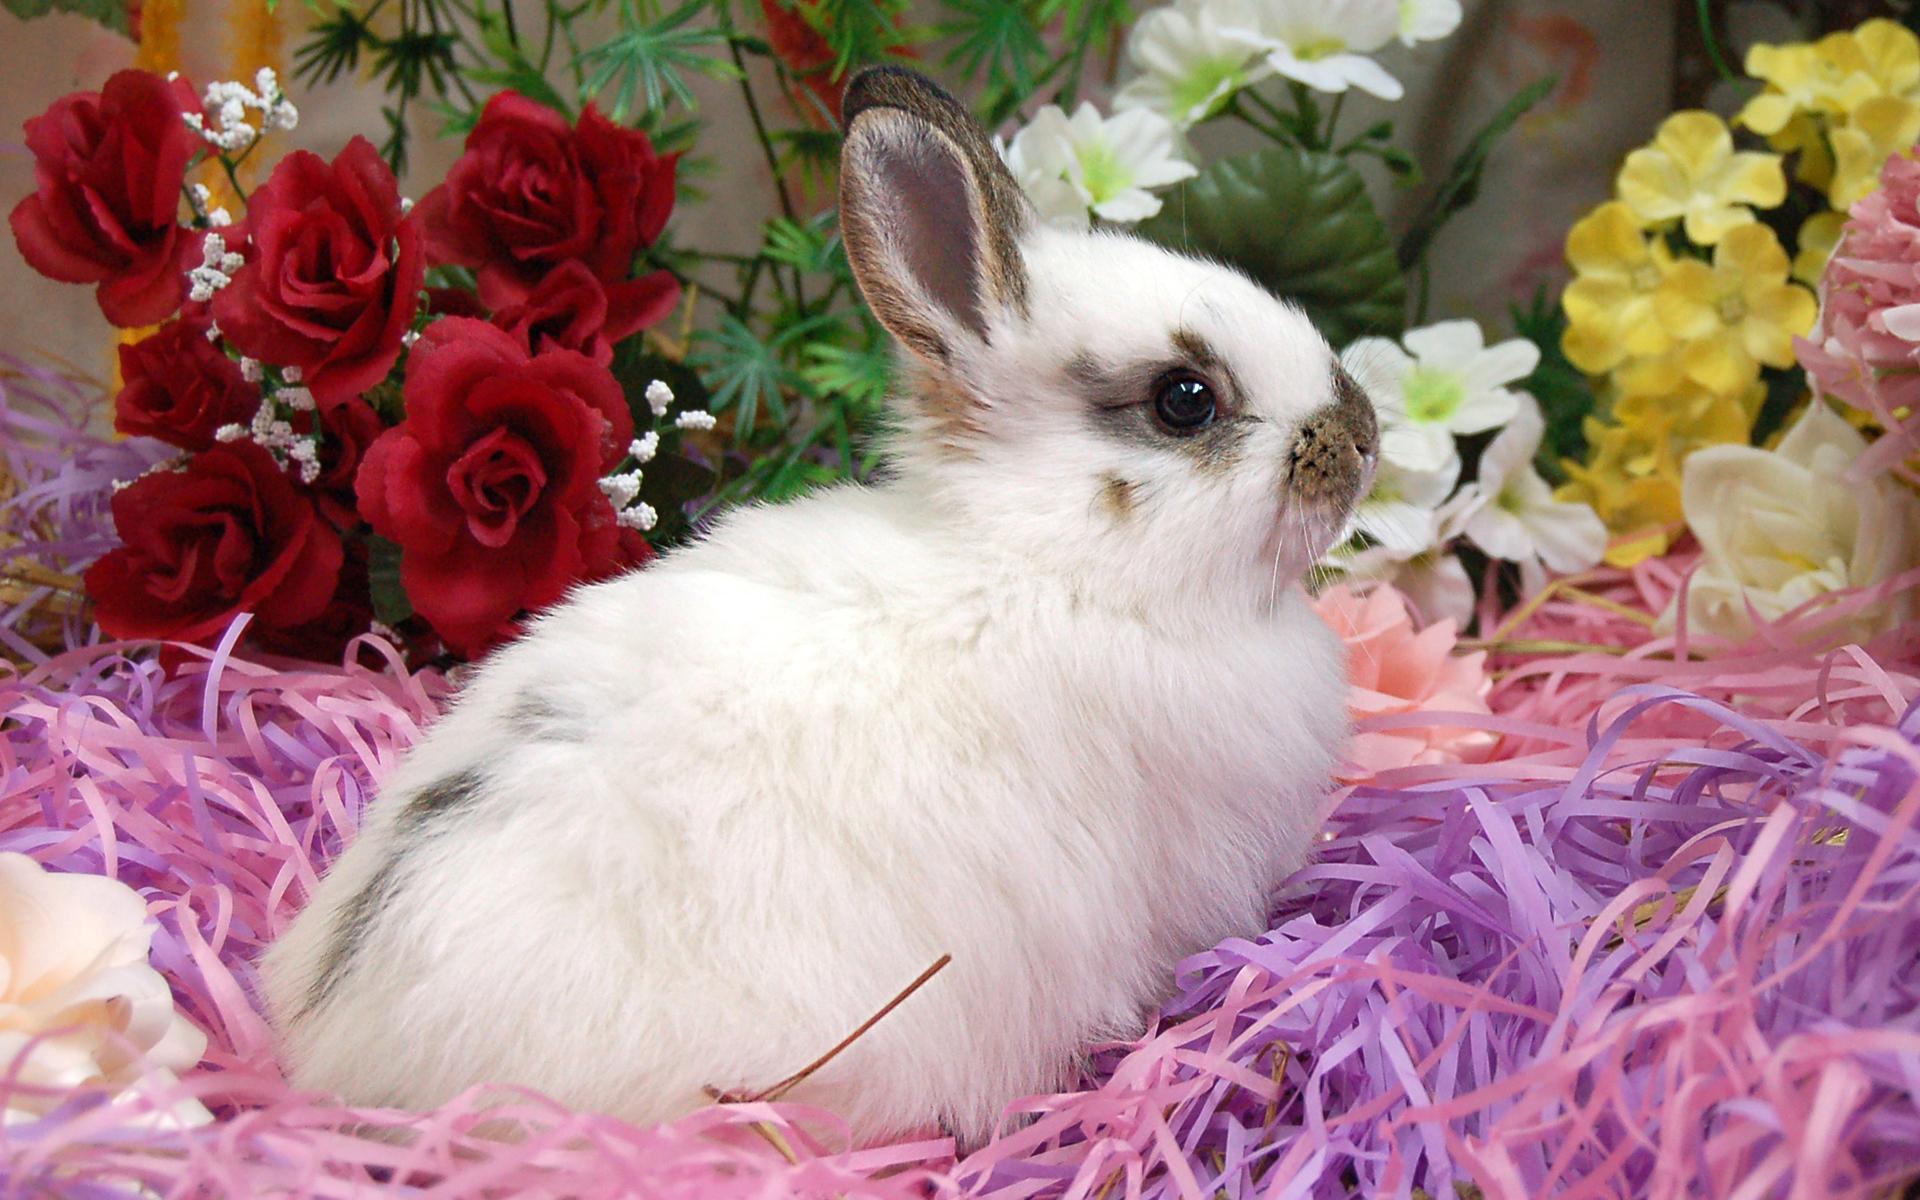 Moril-Easter Bunny HD Wallpaper